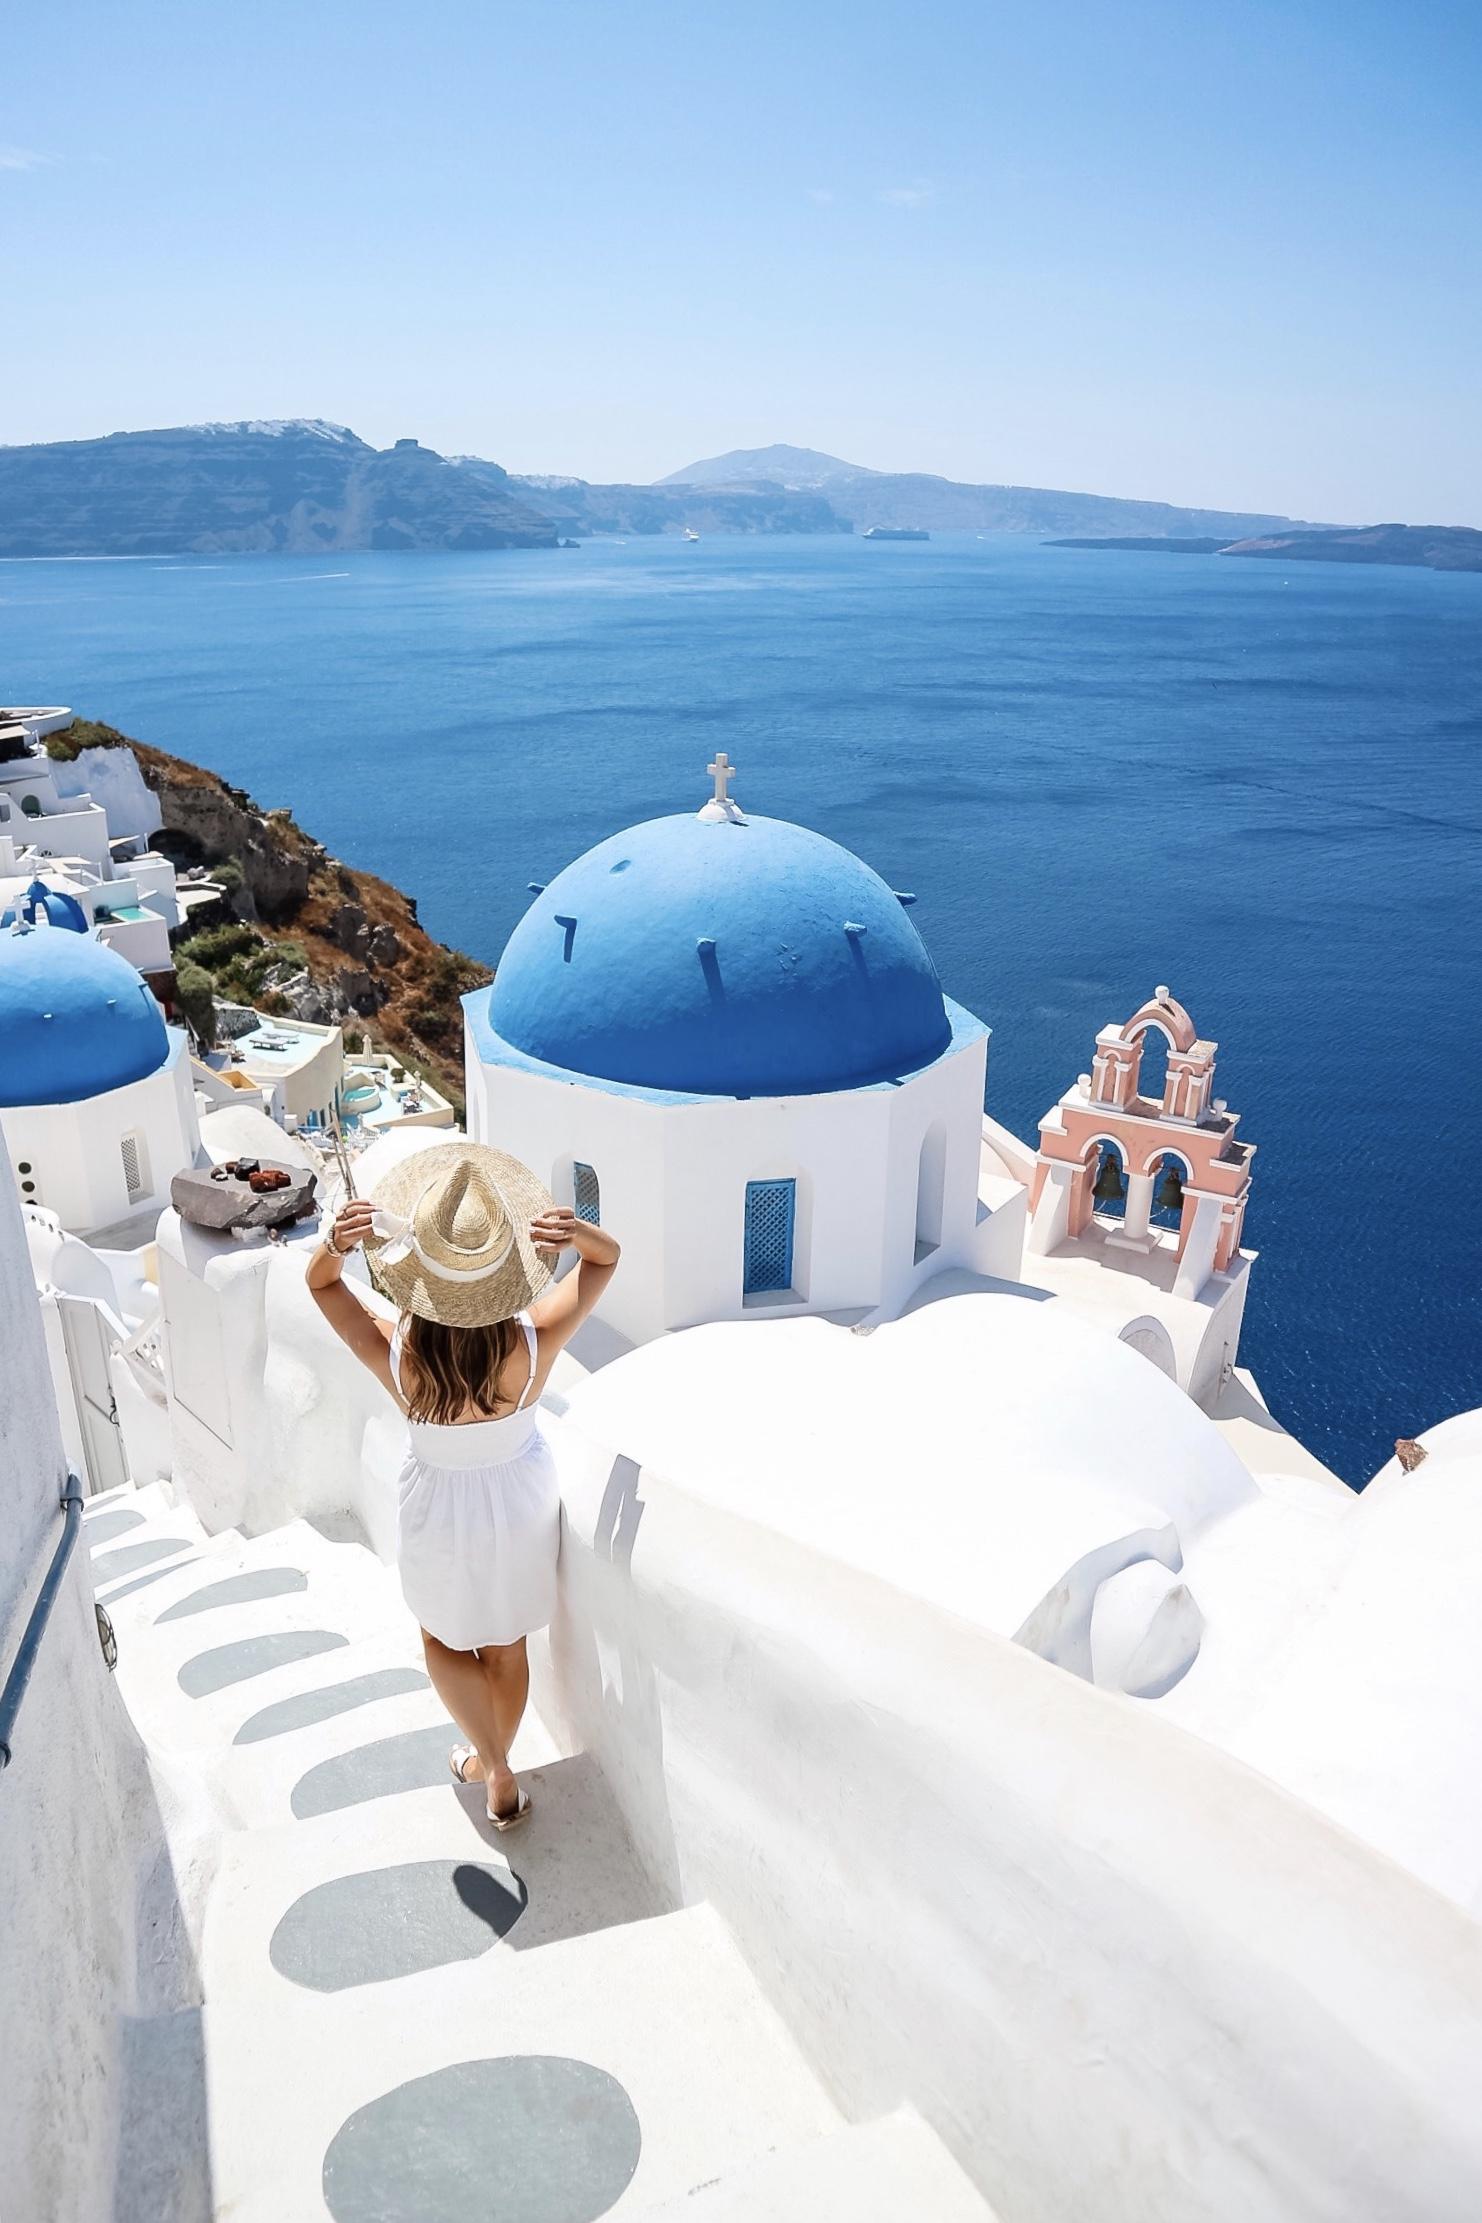 santorini travel guide, oia santorini